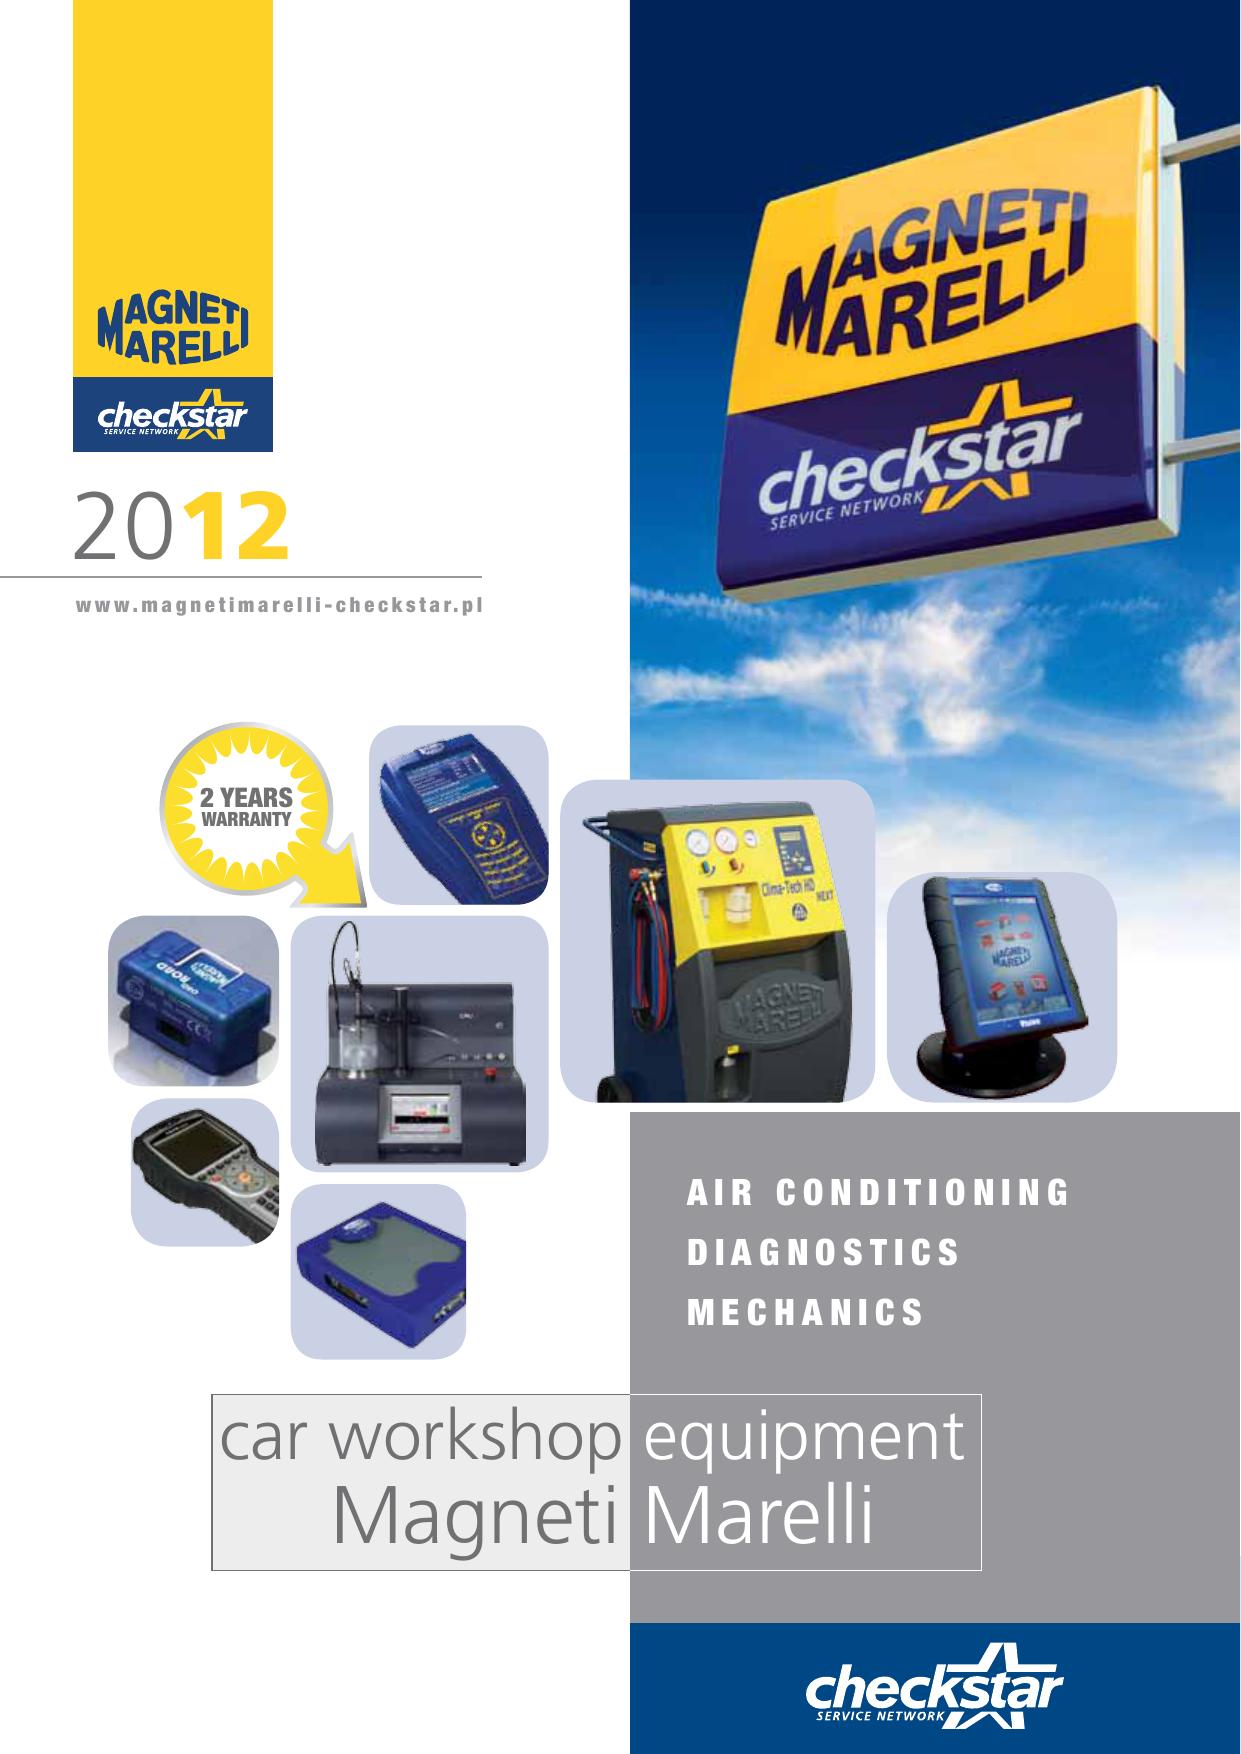 Magneti Marelli Circuit Board Recycling Equipmentoffer Copper Wire Machine